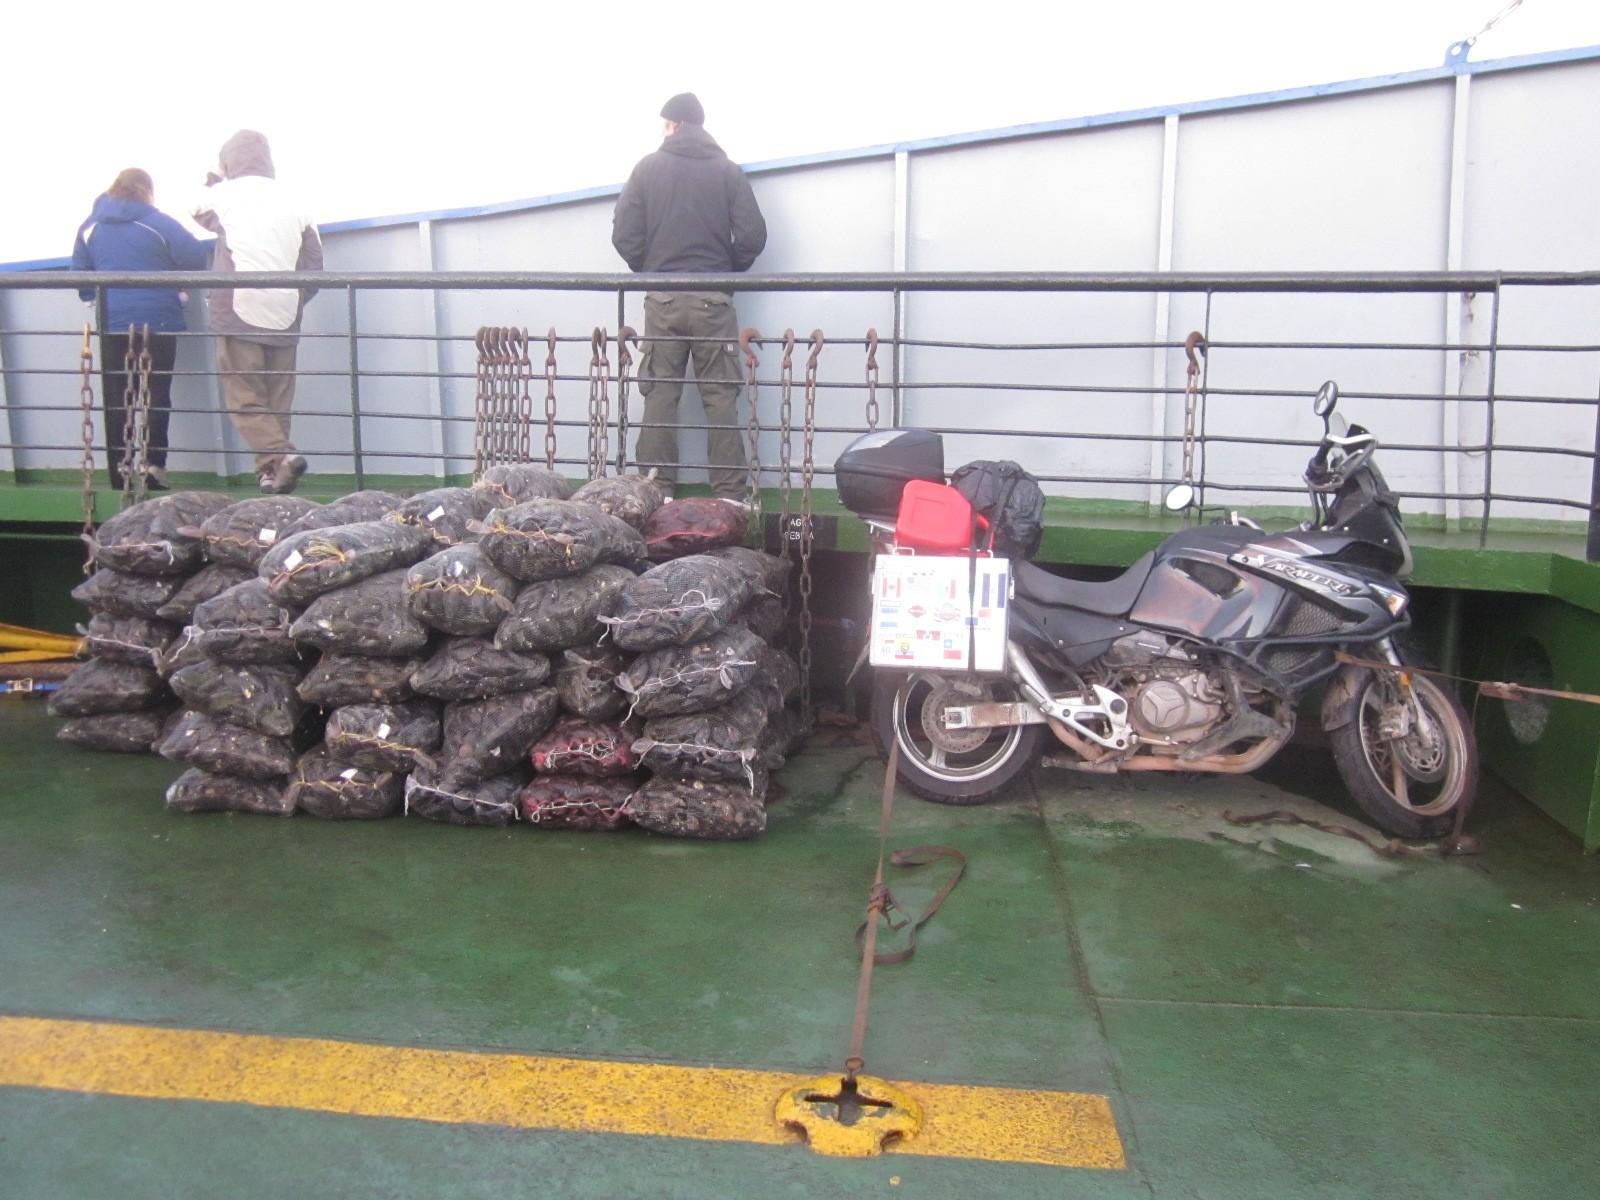 cargo and my bike